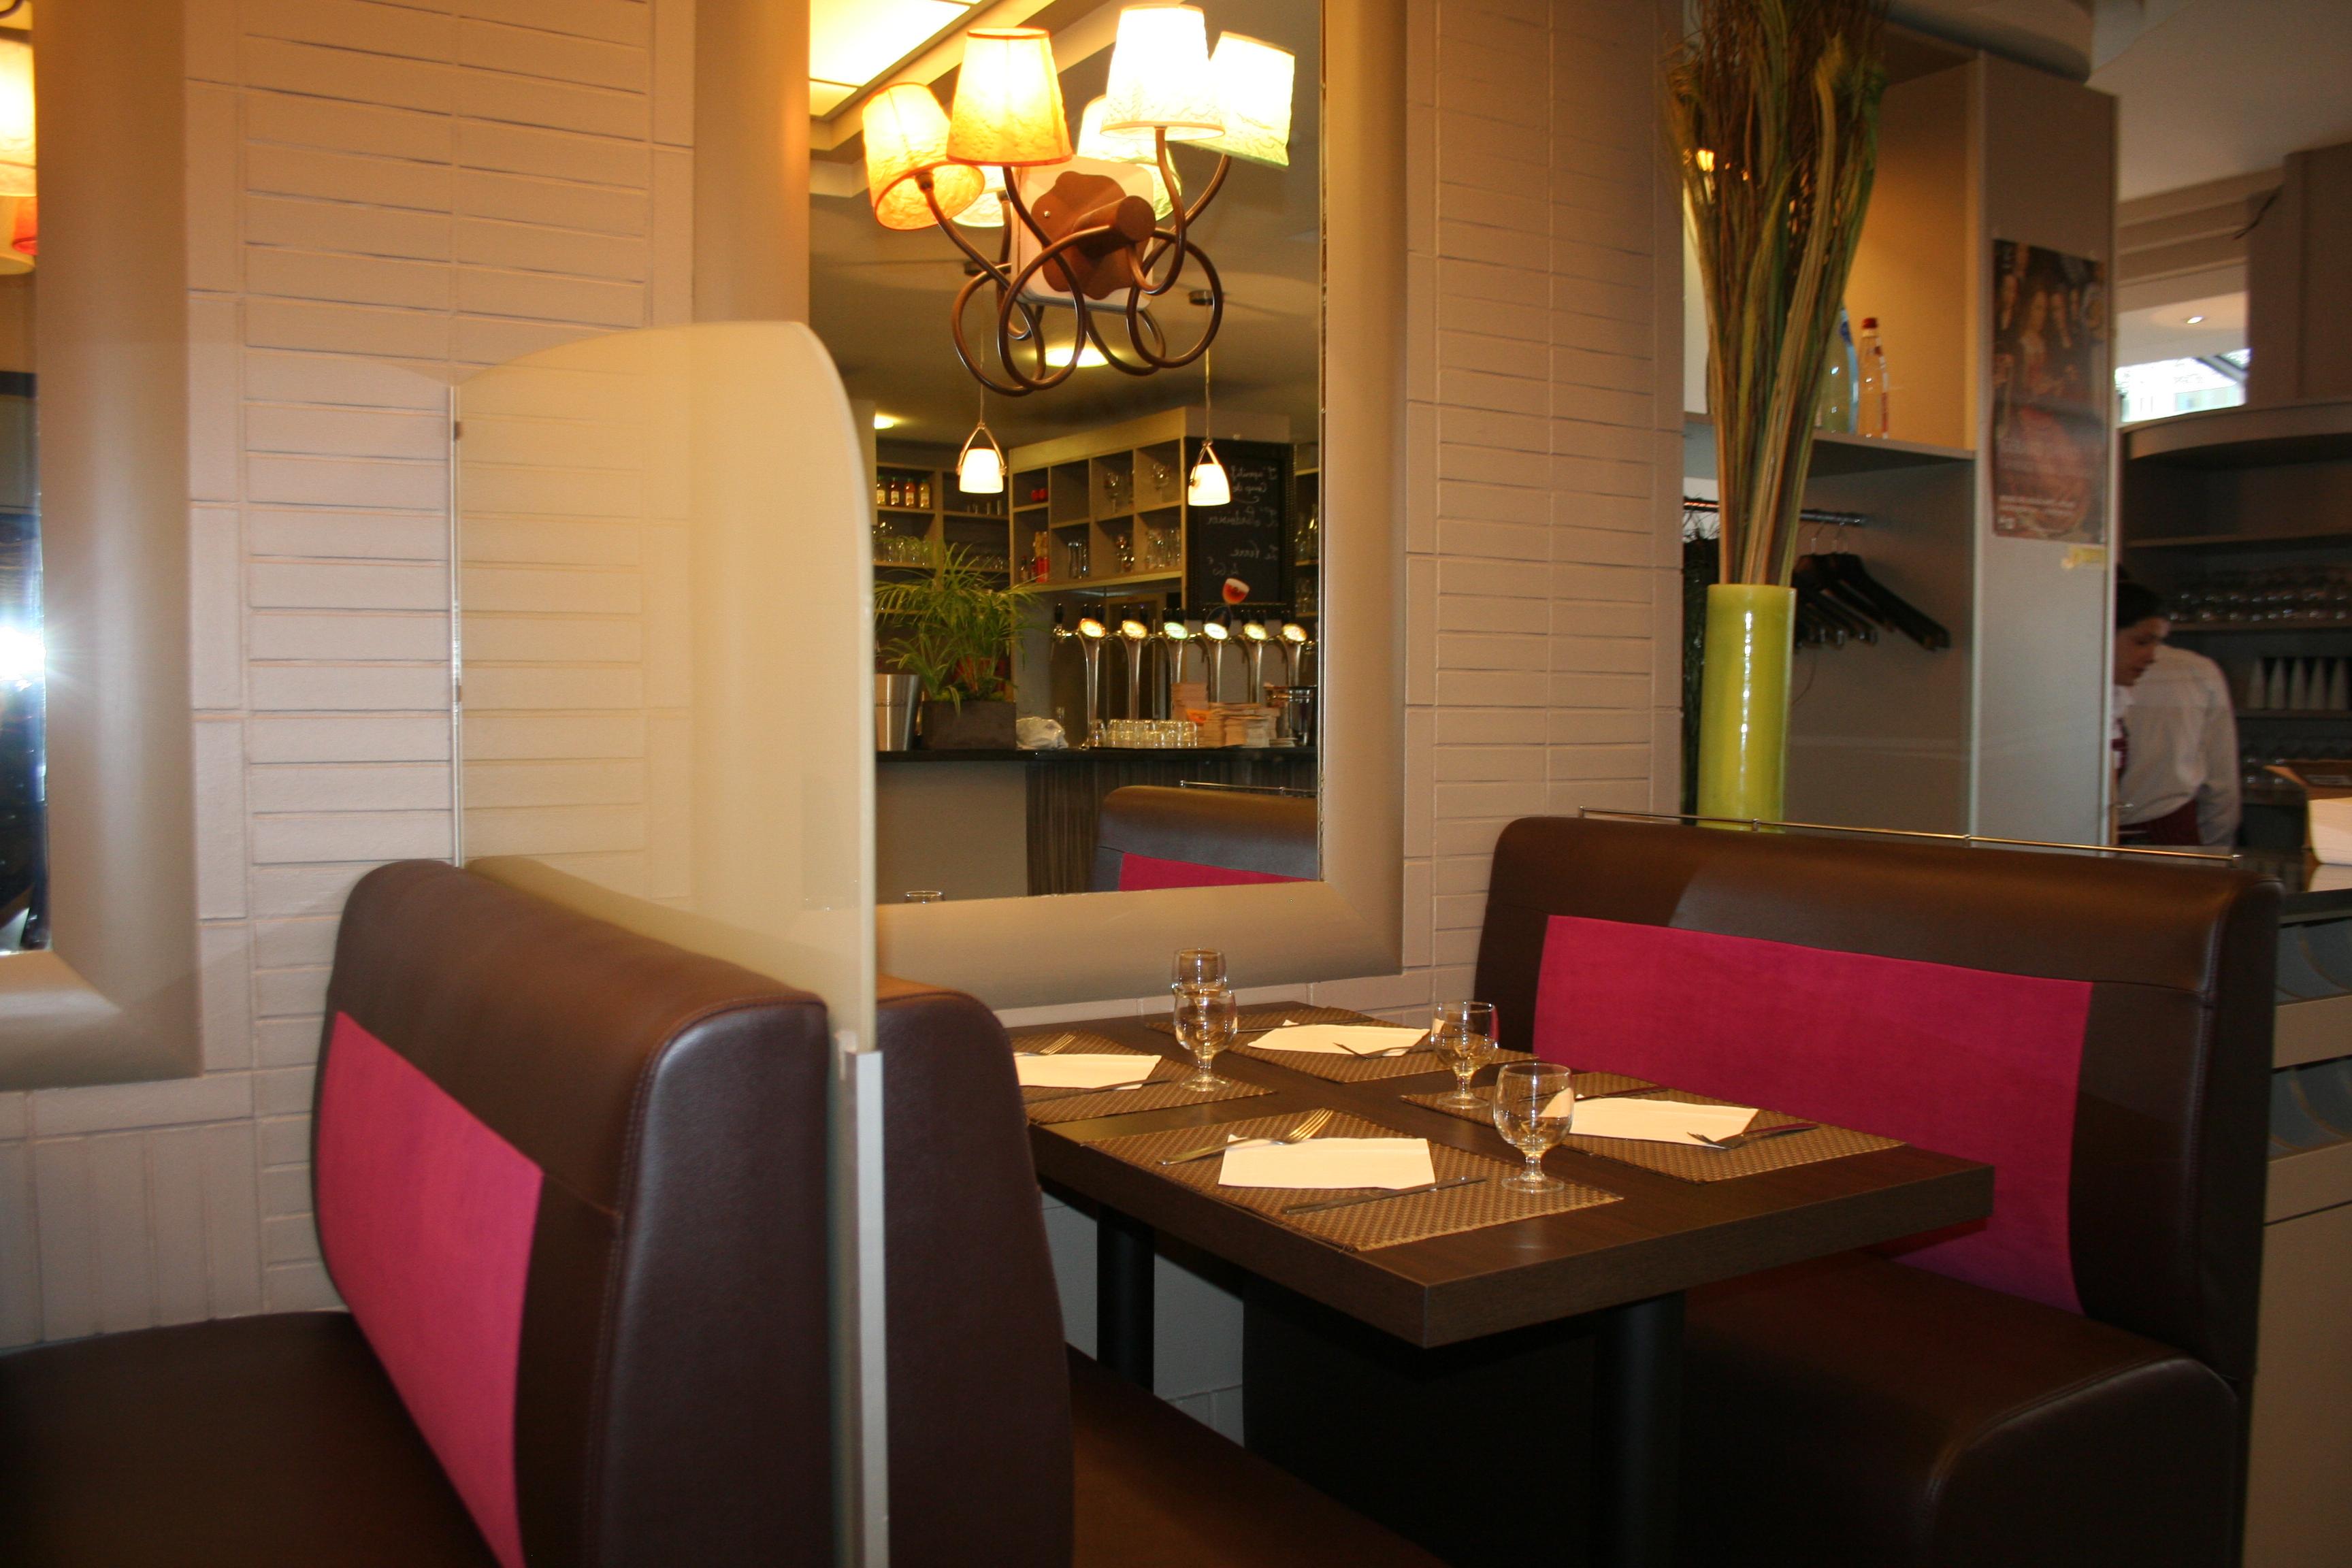 banquette restaurant similicuir m1. Black Bedroom Furniture Sets. Home Design Ideas